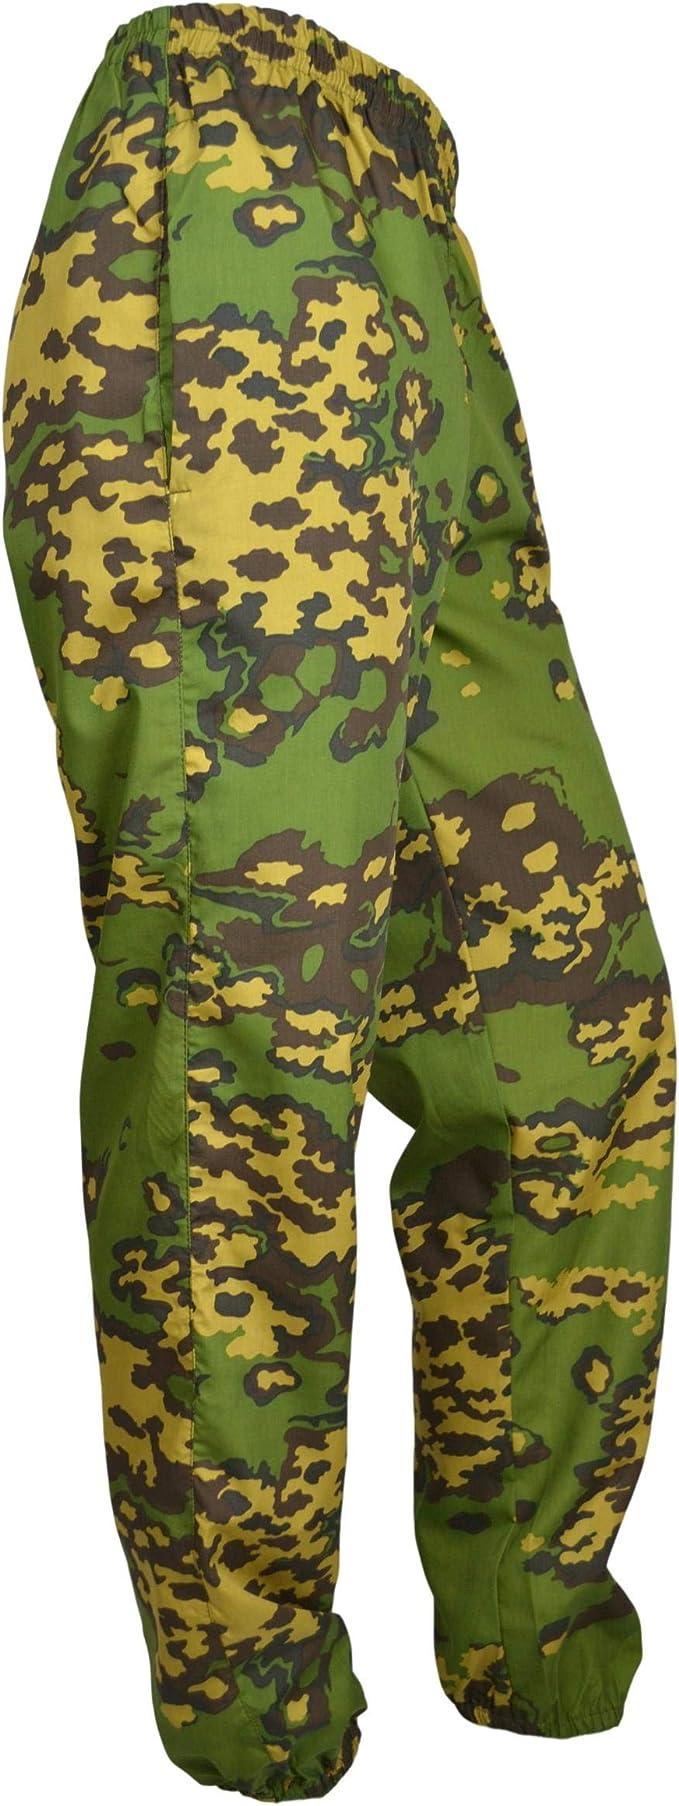 SSO SPOSN Bandana Khaki Gorka Large New Original Russian Army